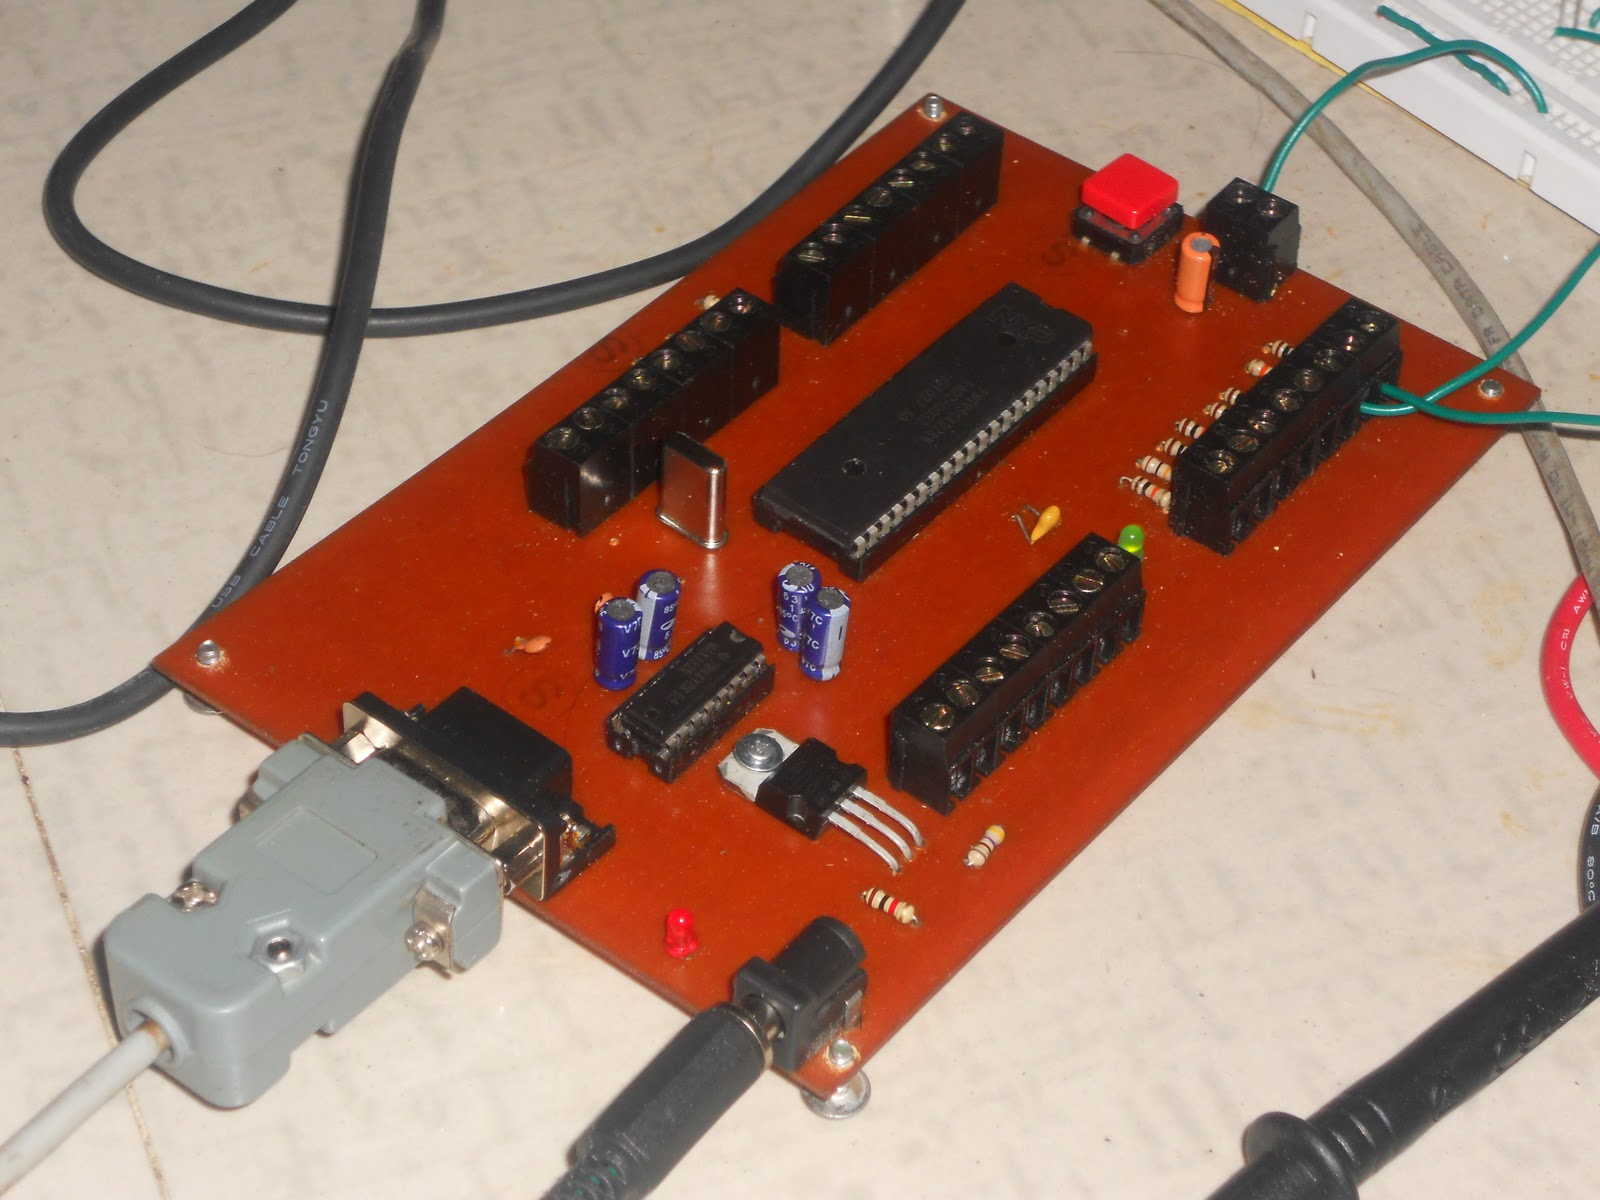 tecfornewbie 8051 isp programmer for nxp design tuturial 8051 programmer development board schematic pcb files 8051programmer [ 1600 x 1200 Pixel ]